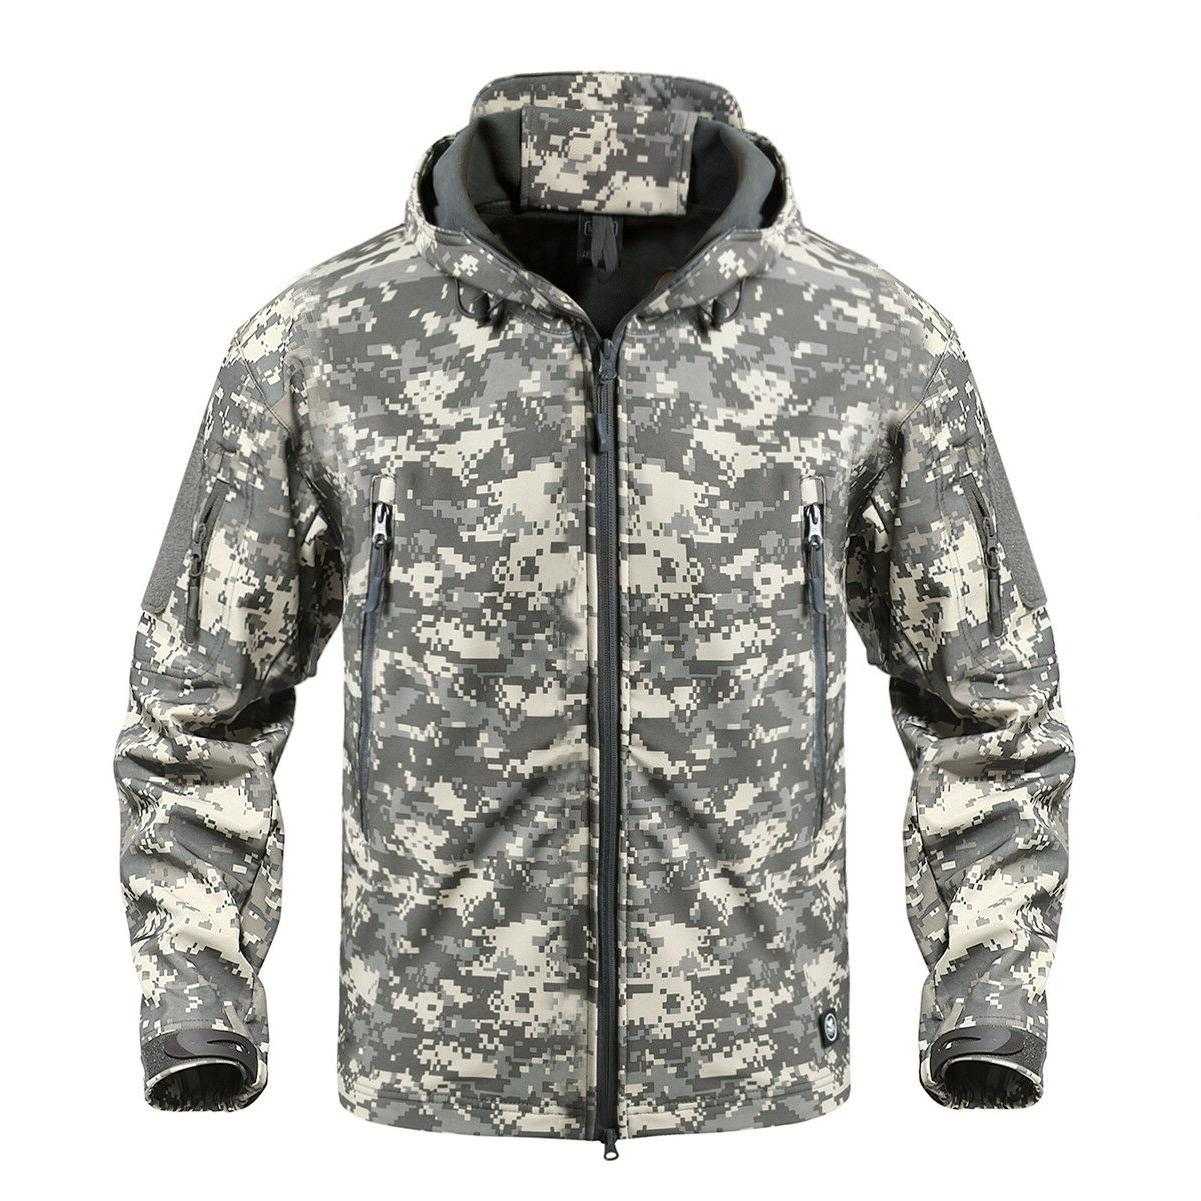 TACVASEN Jackets Coats Expedition Tactical